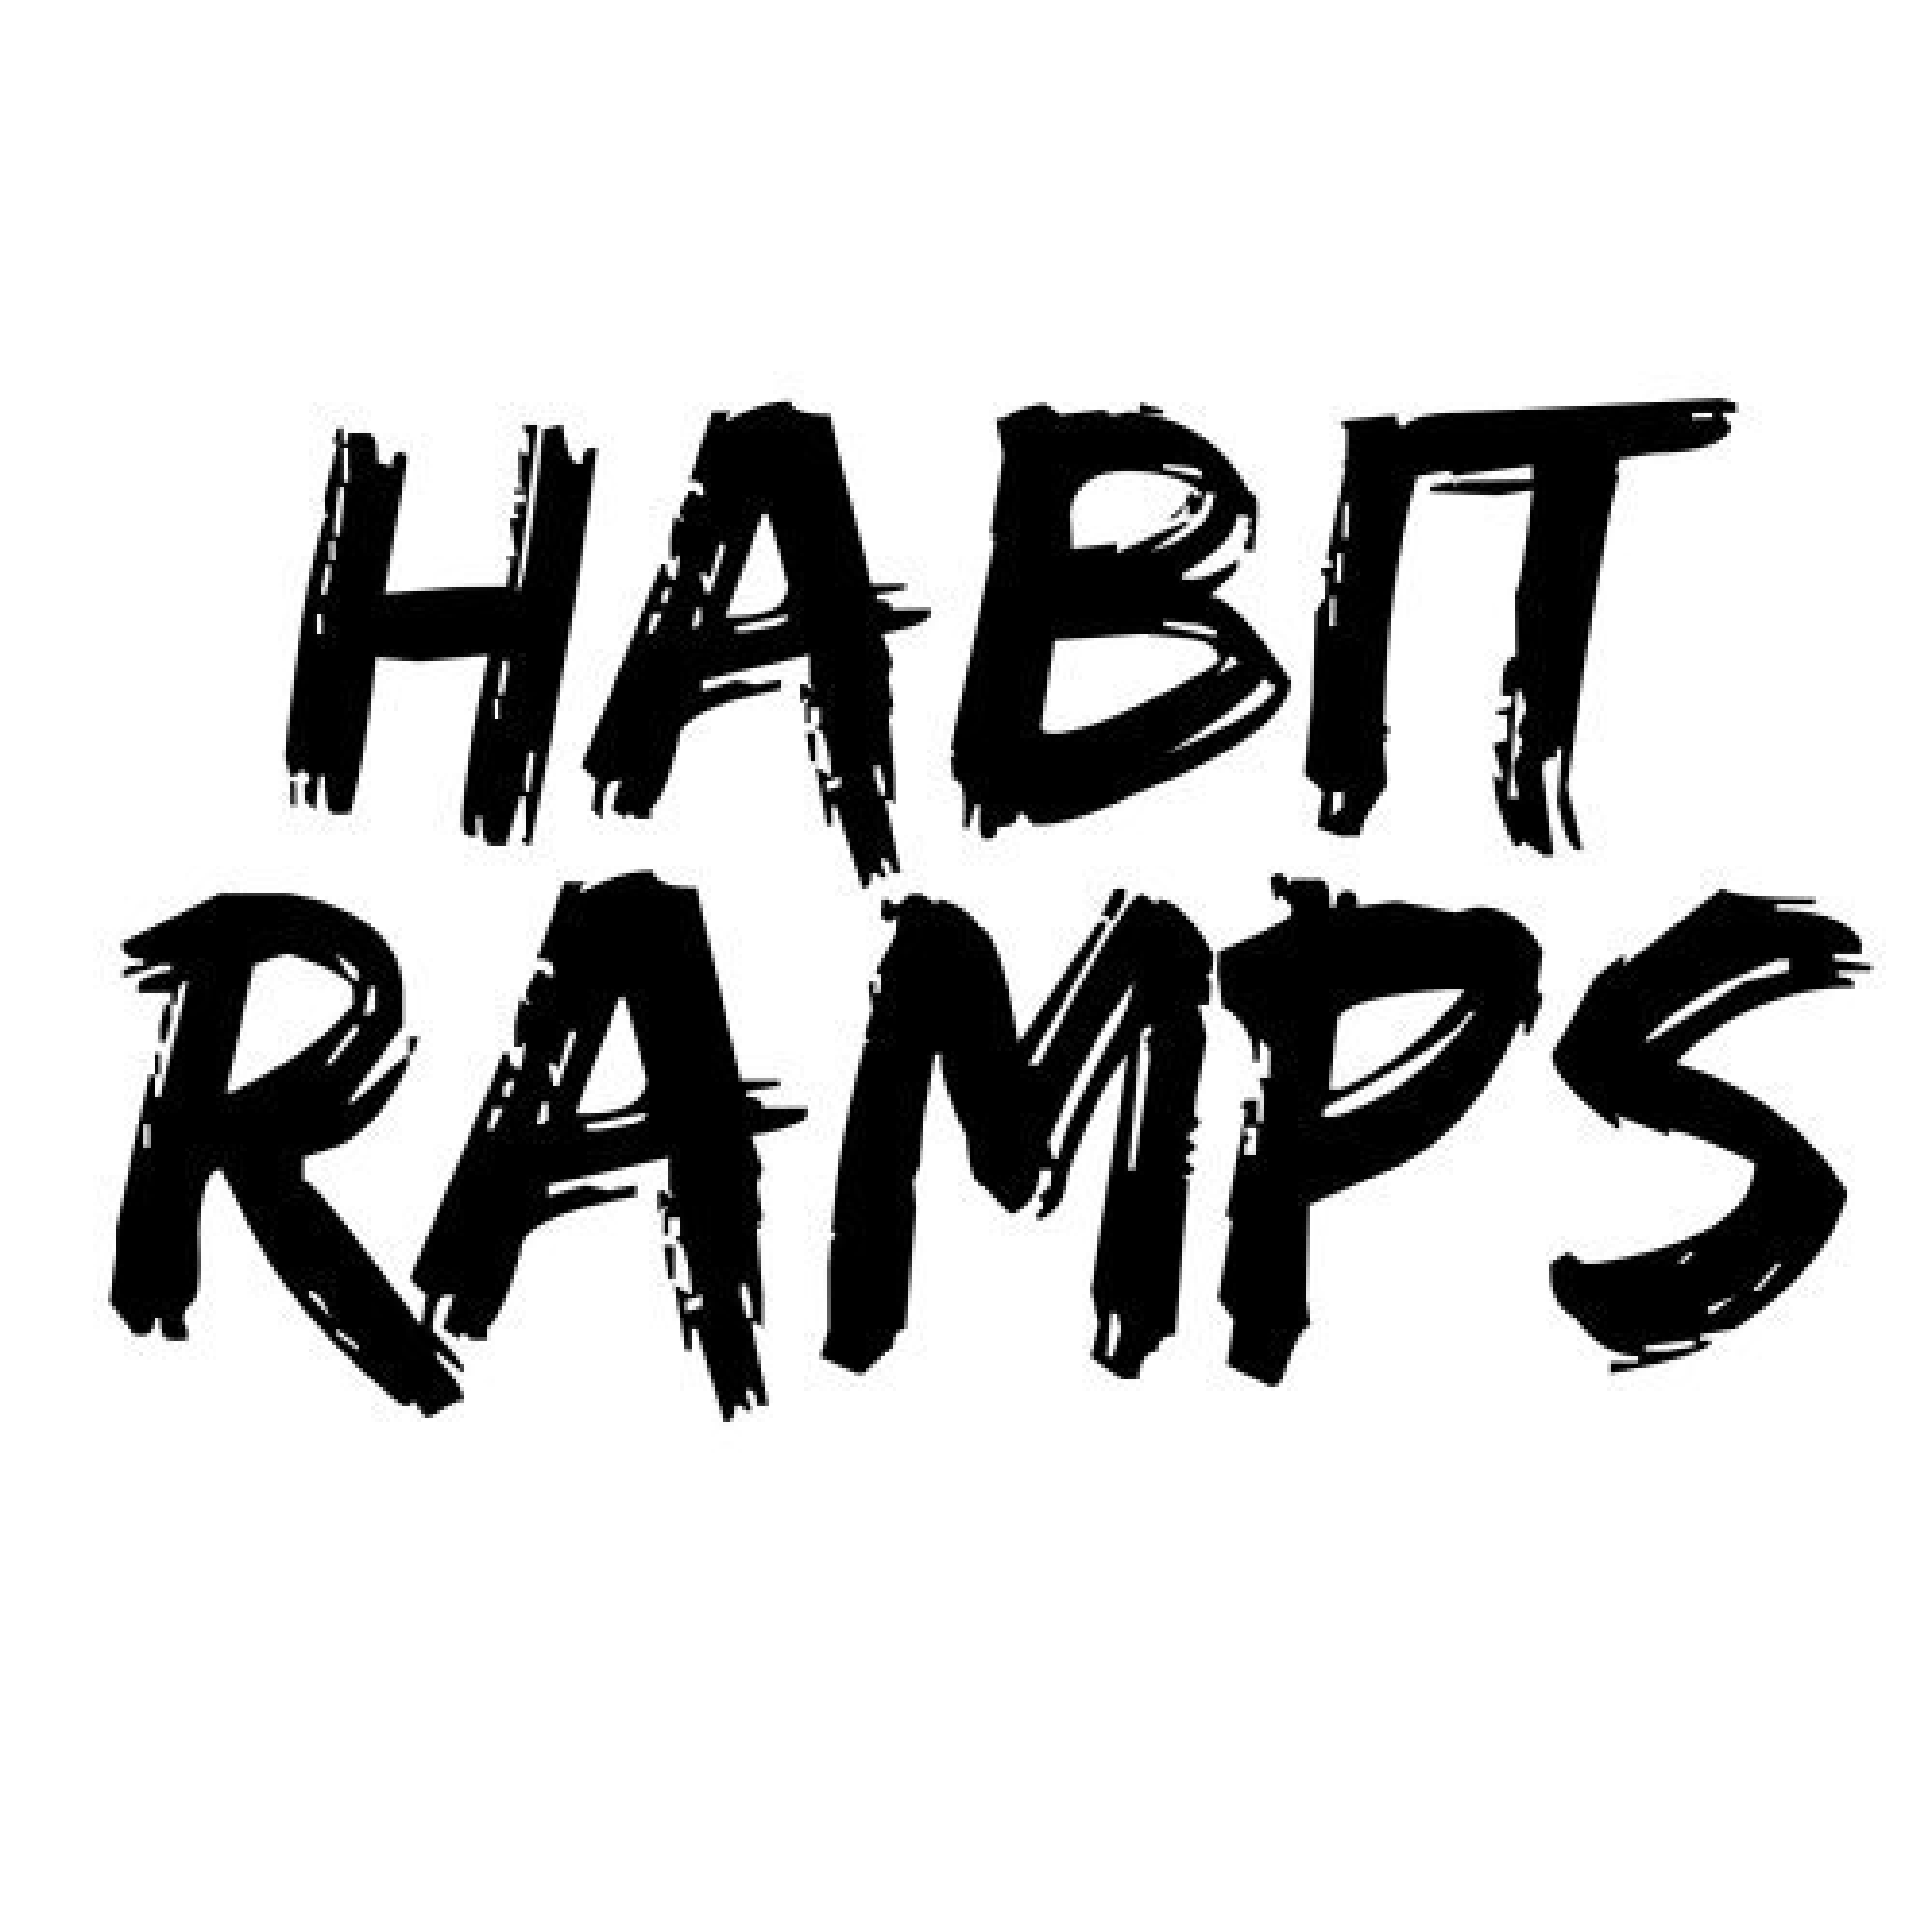 the_power_of_habit_ramps_dean_bokhari